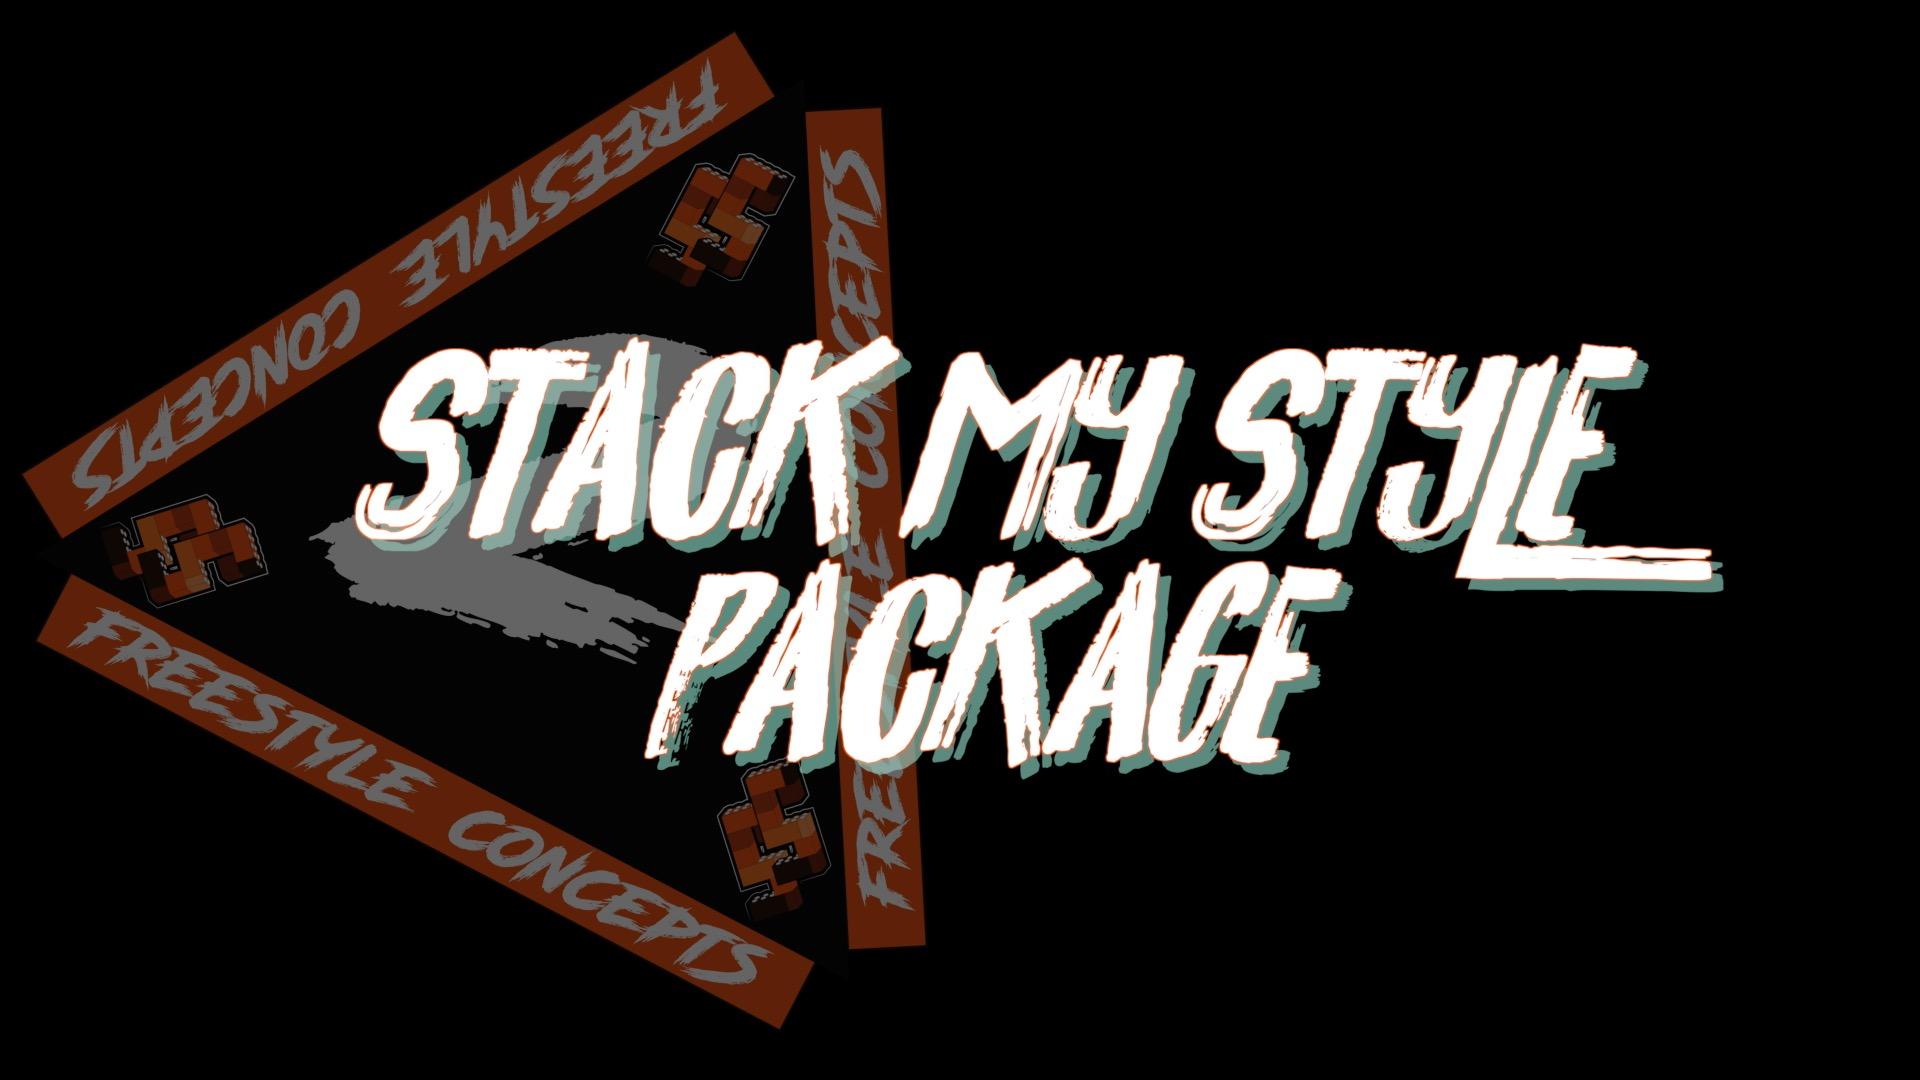 Stackmystylepackage.jpg